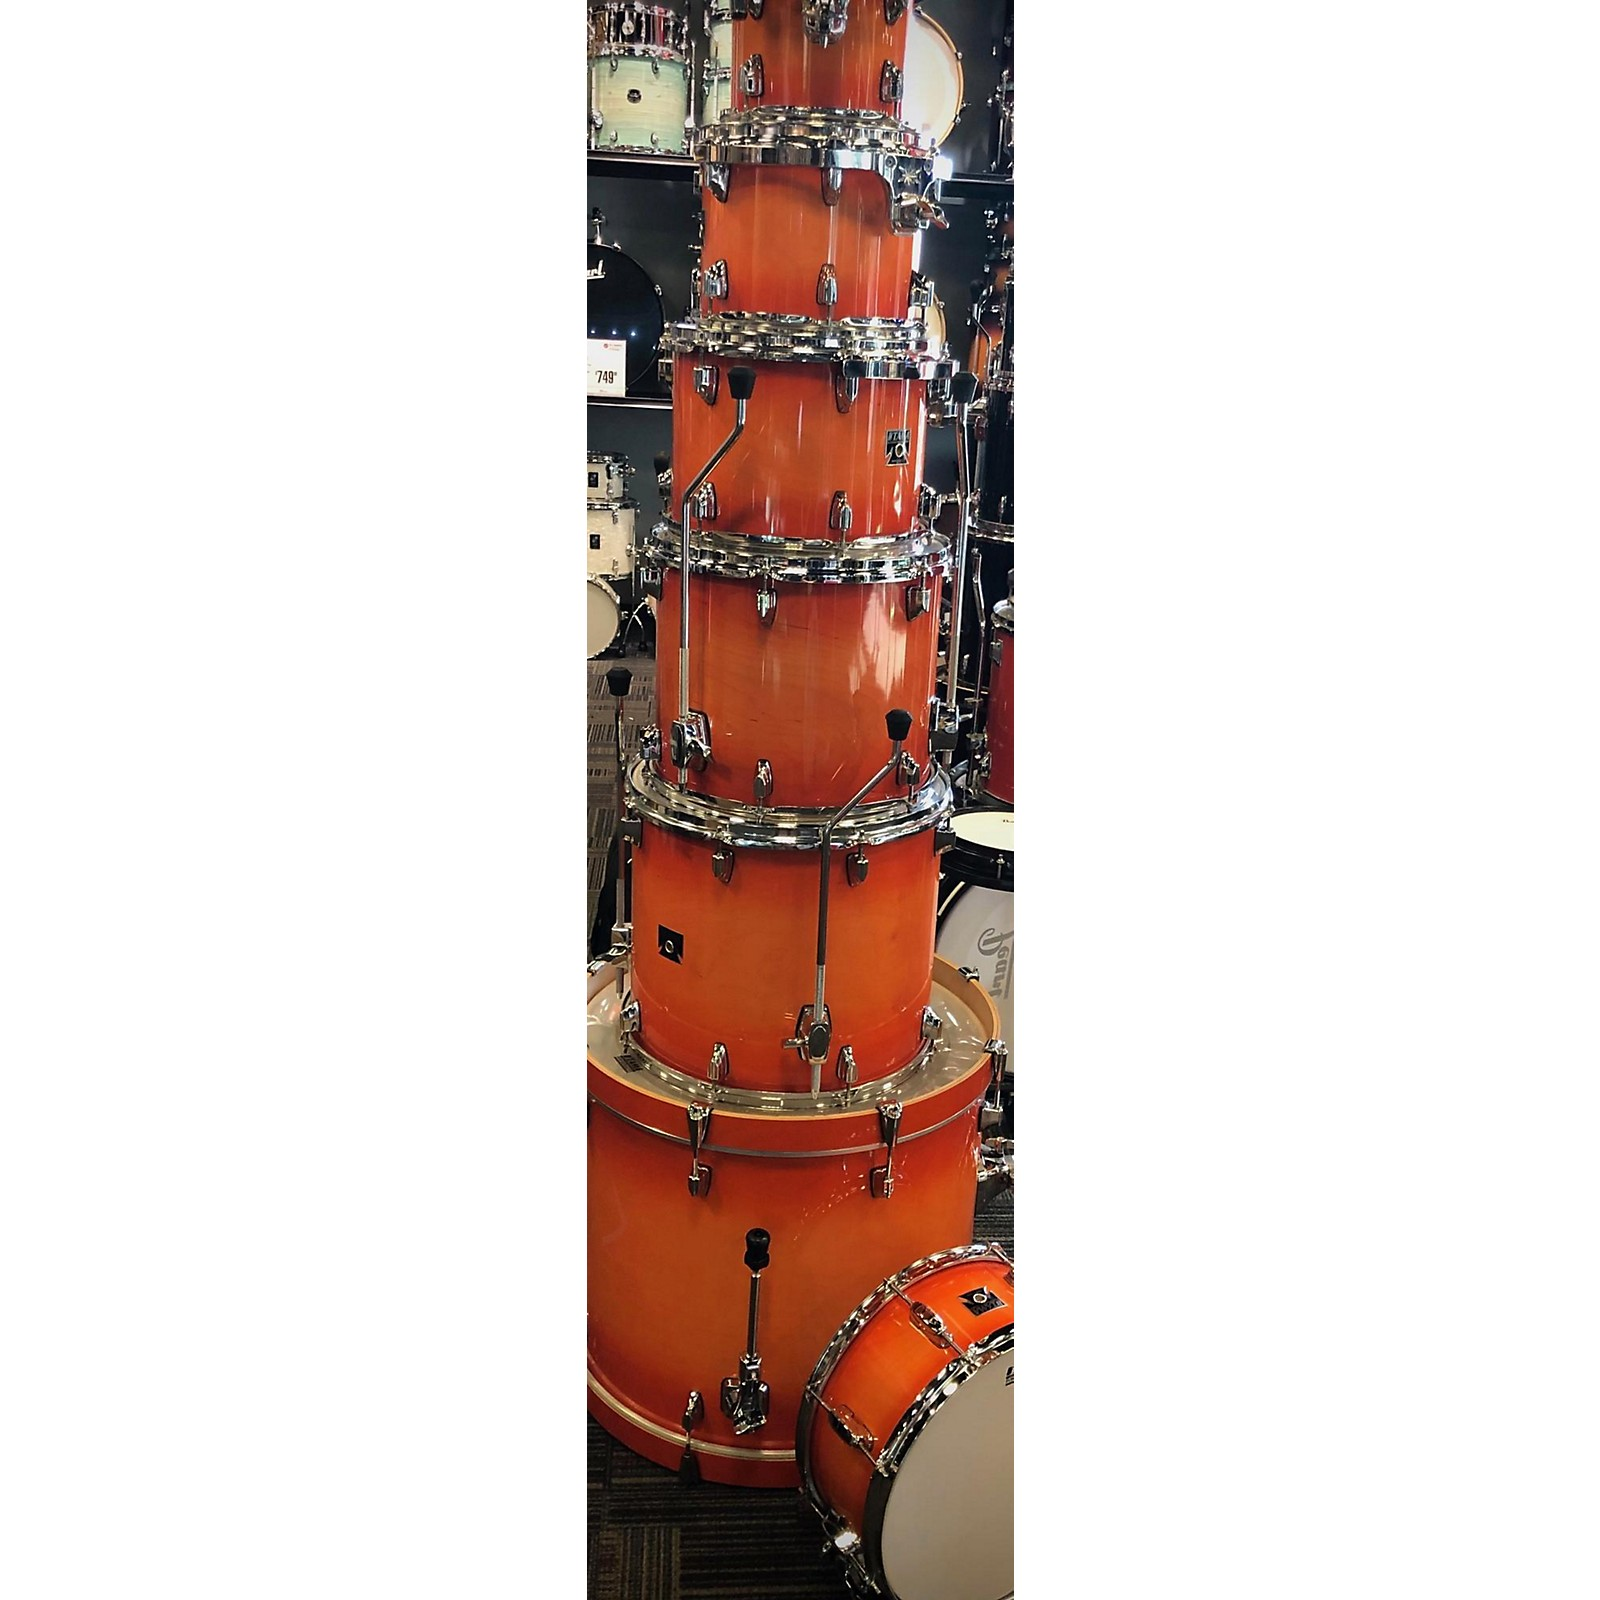 TAMA 2020s Superstar Drum Kit